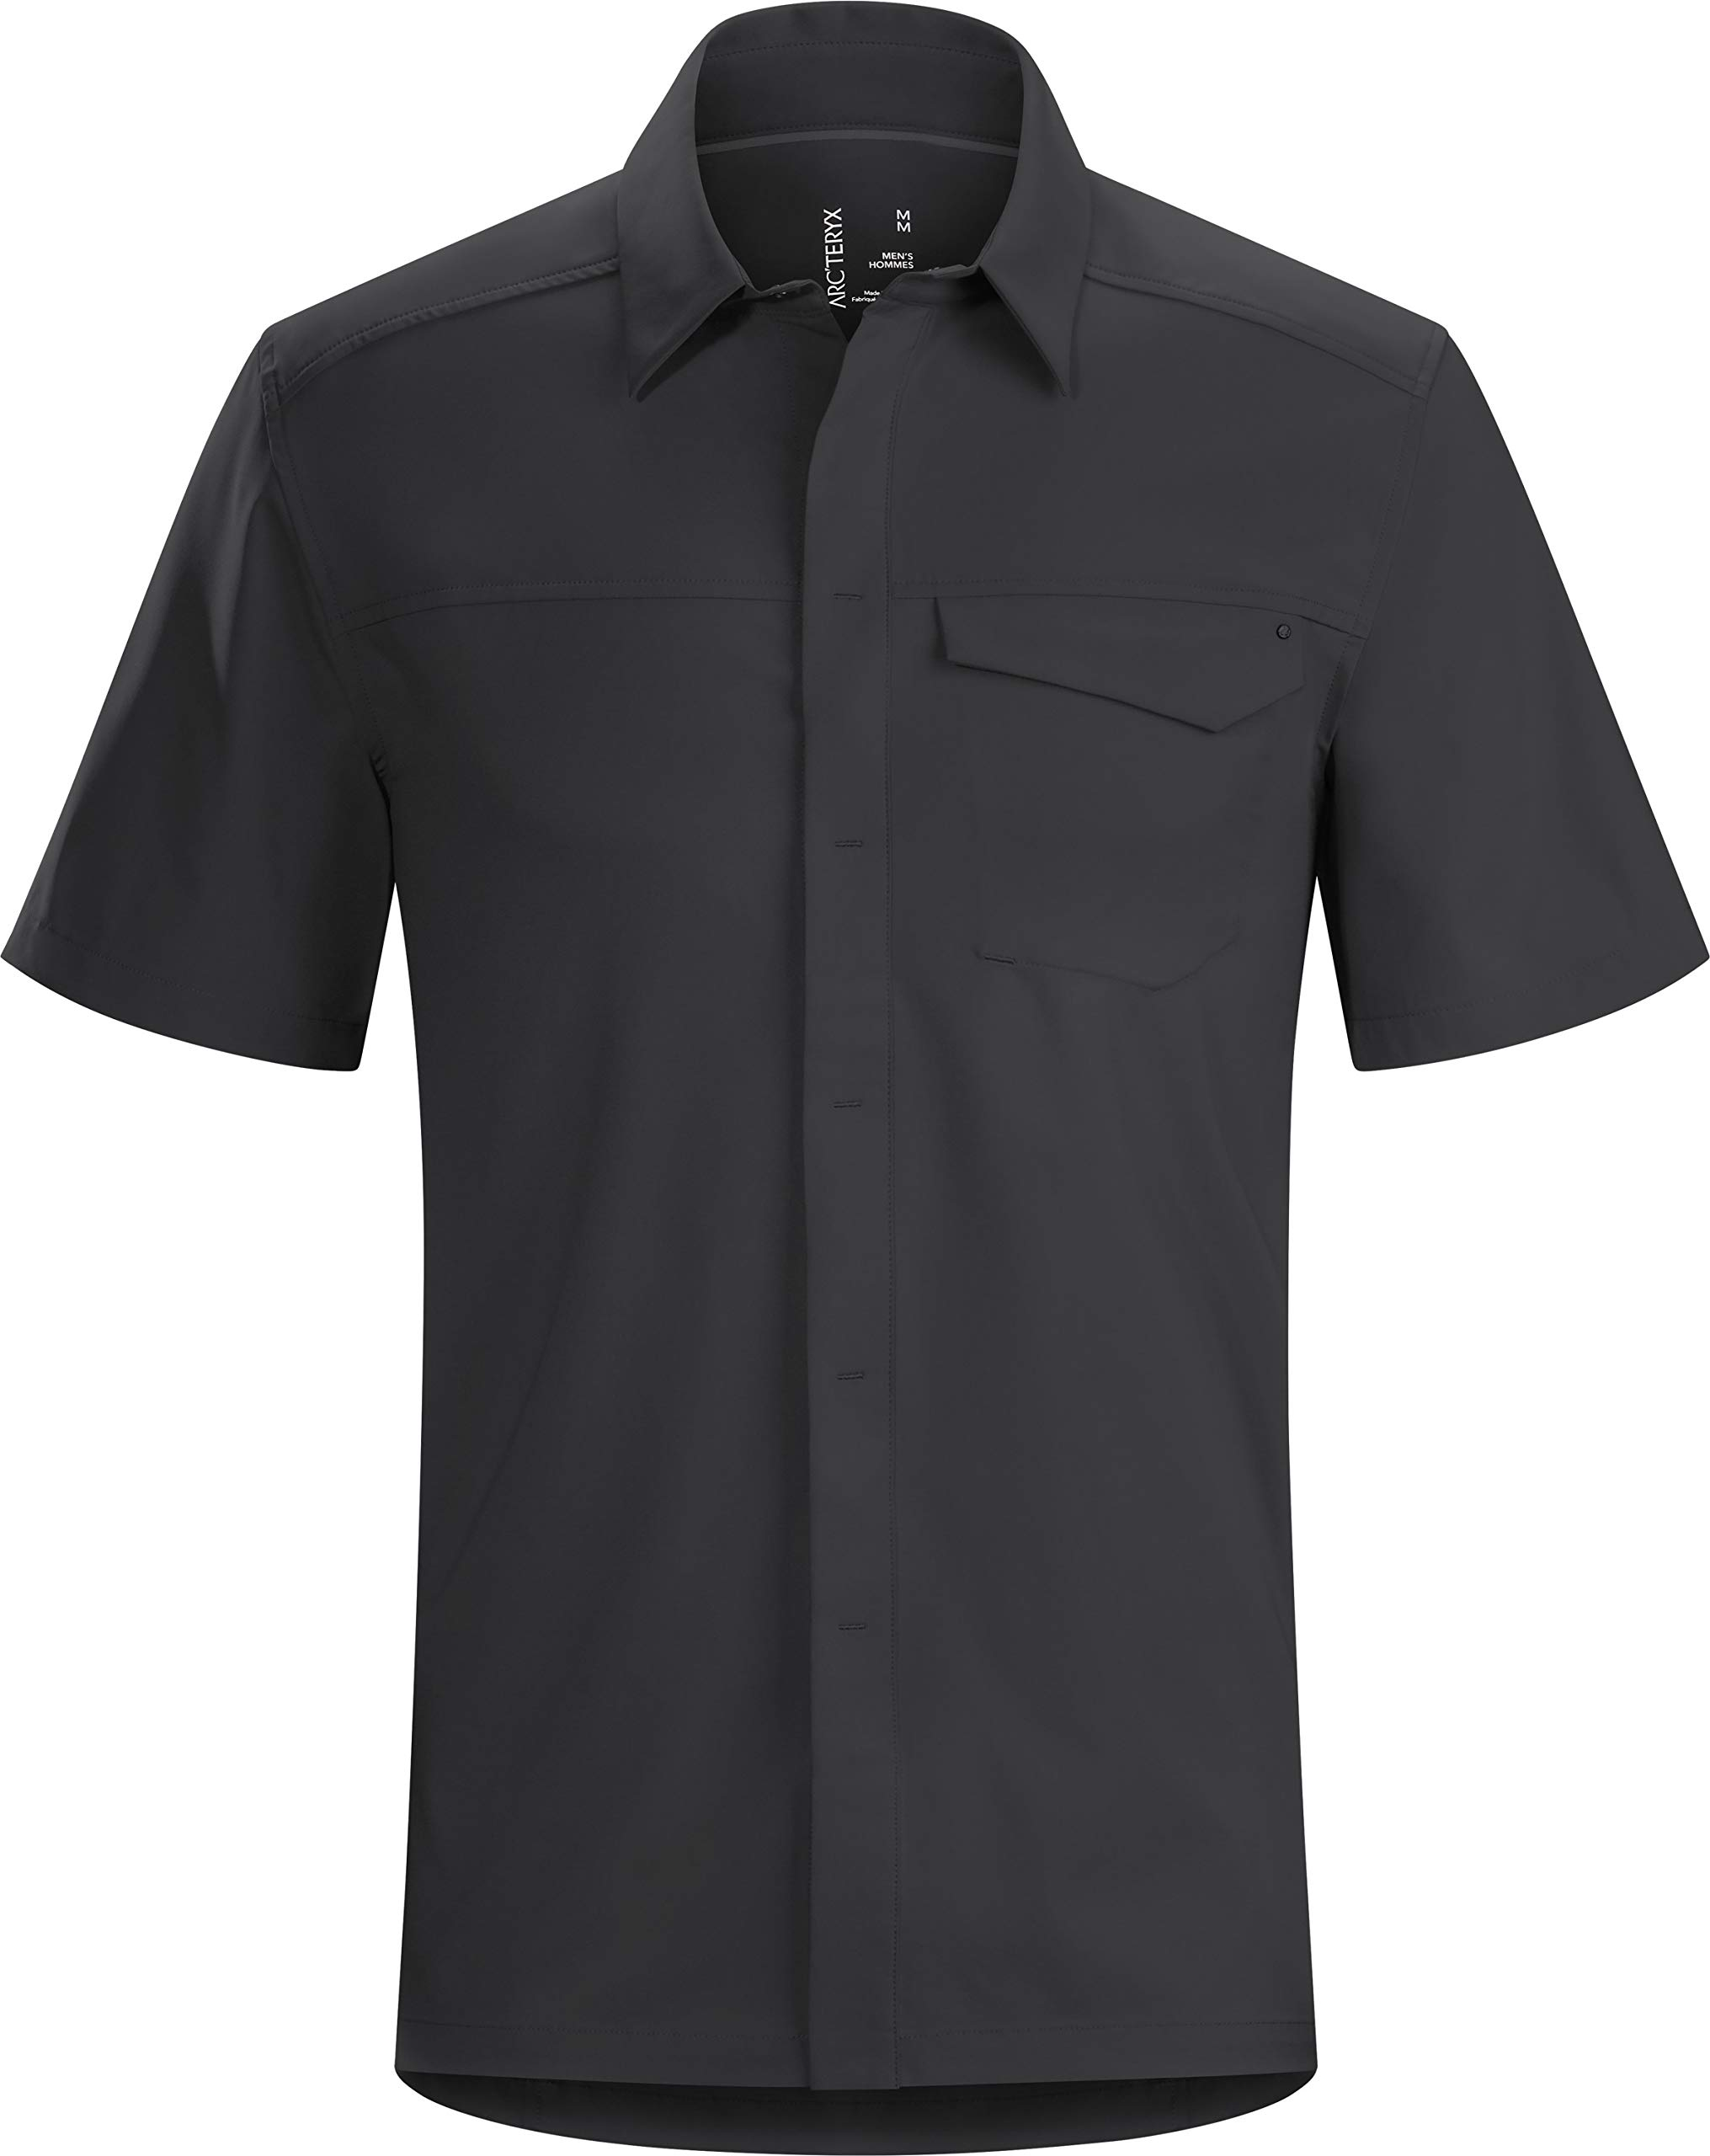 Arc'teryx Skyline SS Shirt Men's (Black, Small)